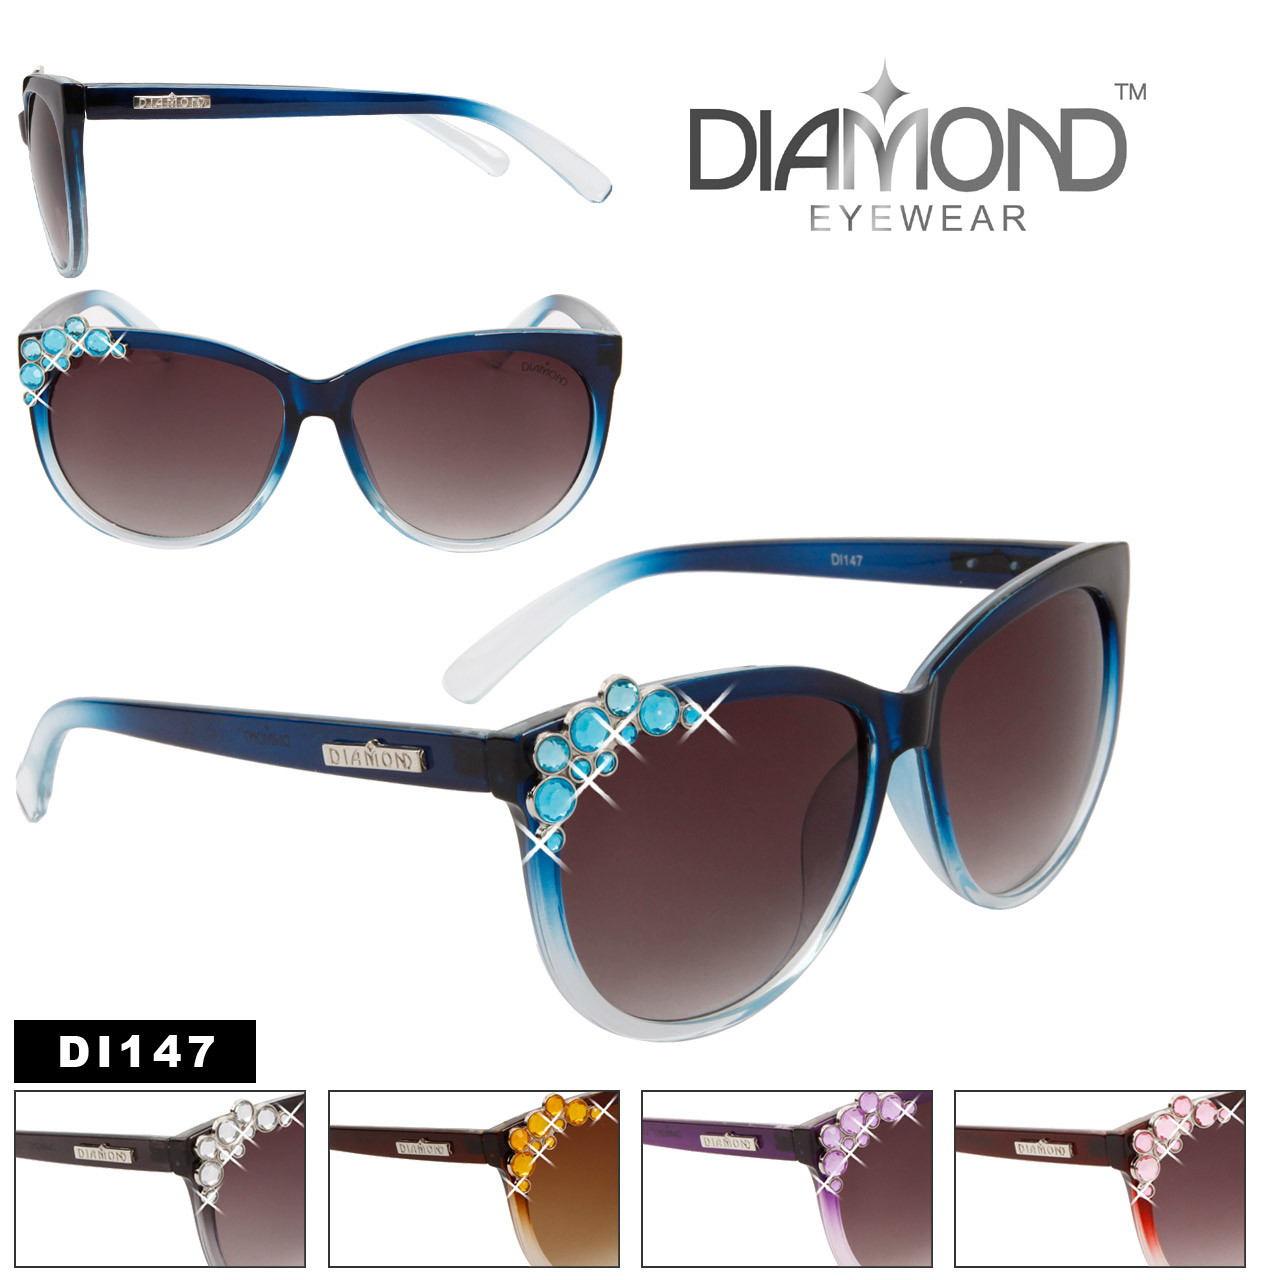 Diamond™ Eyewear Sunglasses Wholesale - Style # DI147